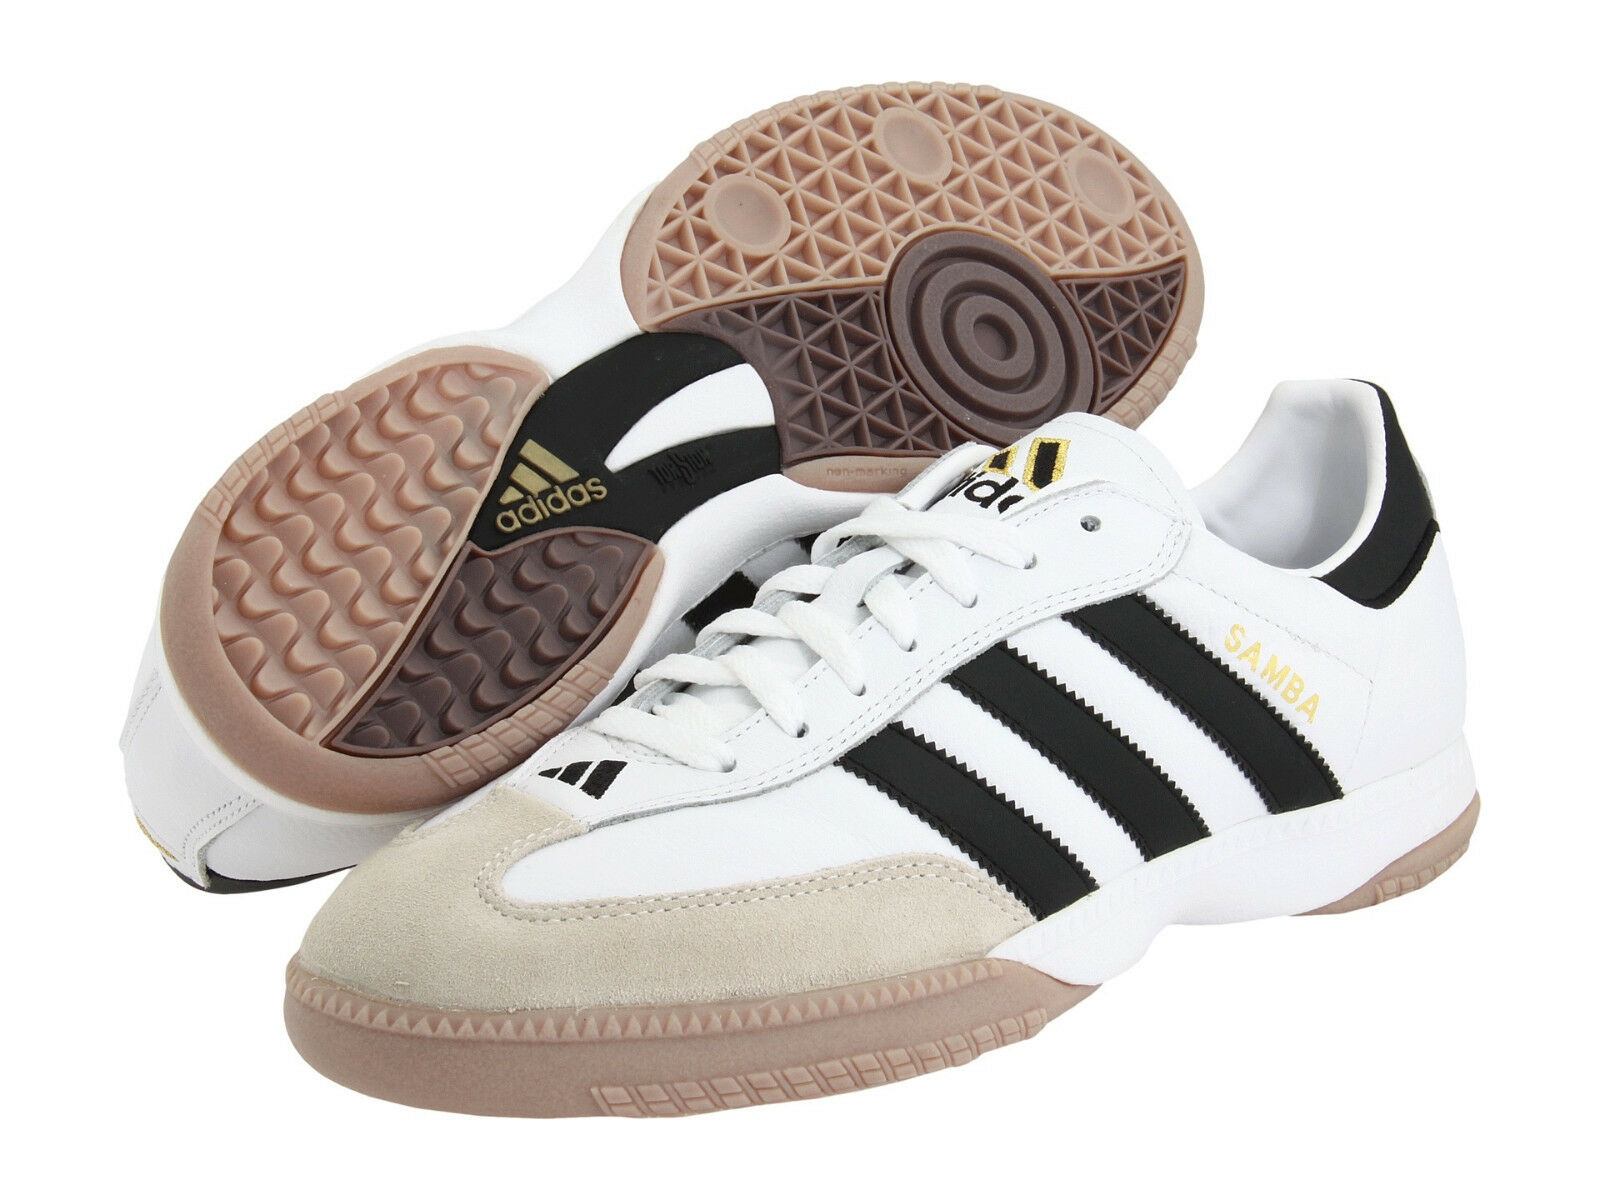 Adidas bianco, samba del calcio indoor bianco, Adidas scarpe da ginnastica 661694 Uomo numero 7 6461b6